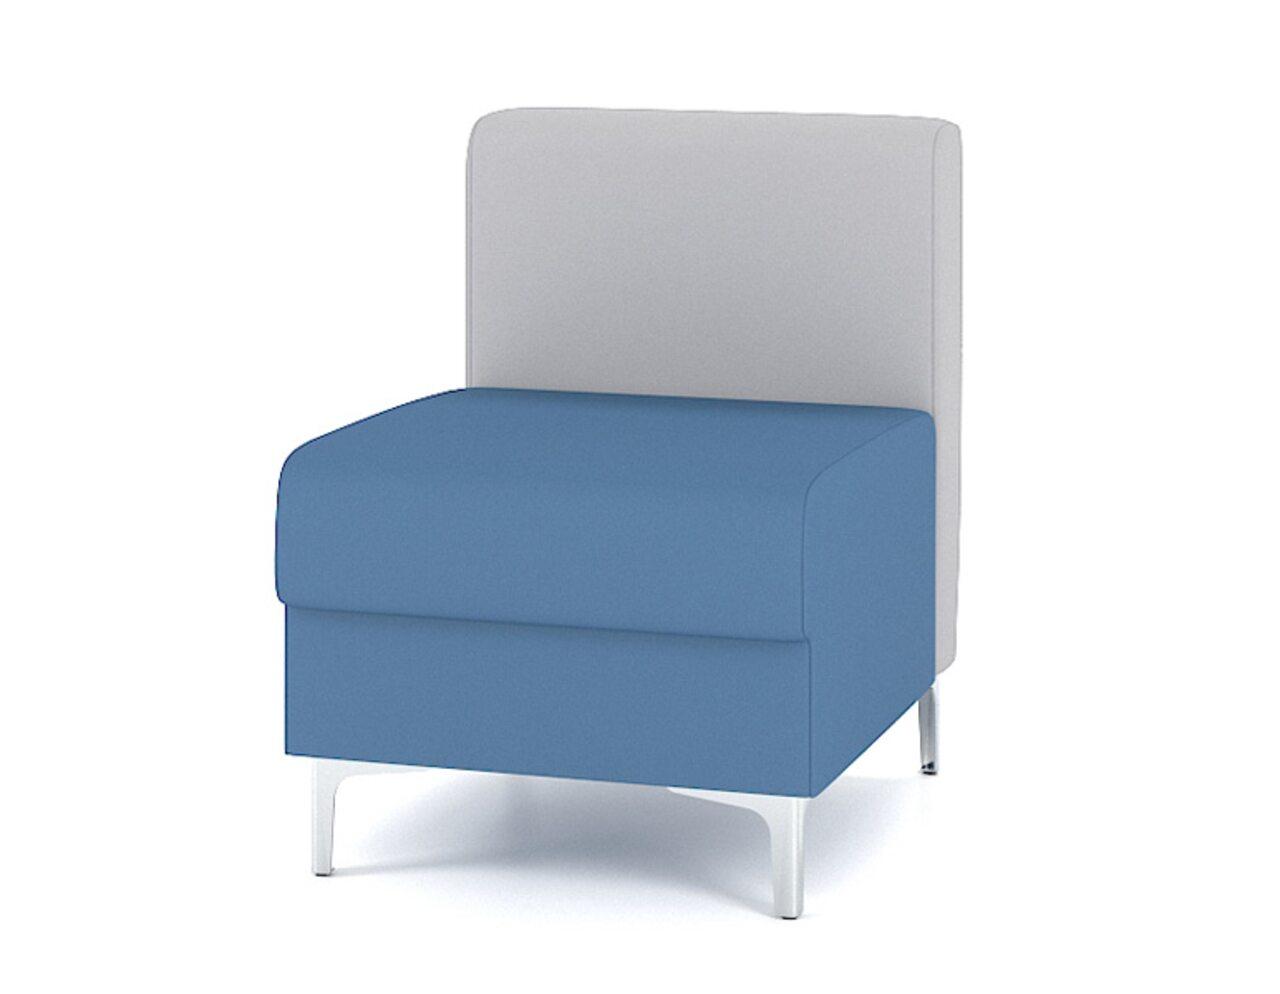 КреслоM6-1D  М6 Soft room 57x70x74 - фото 1